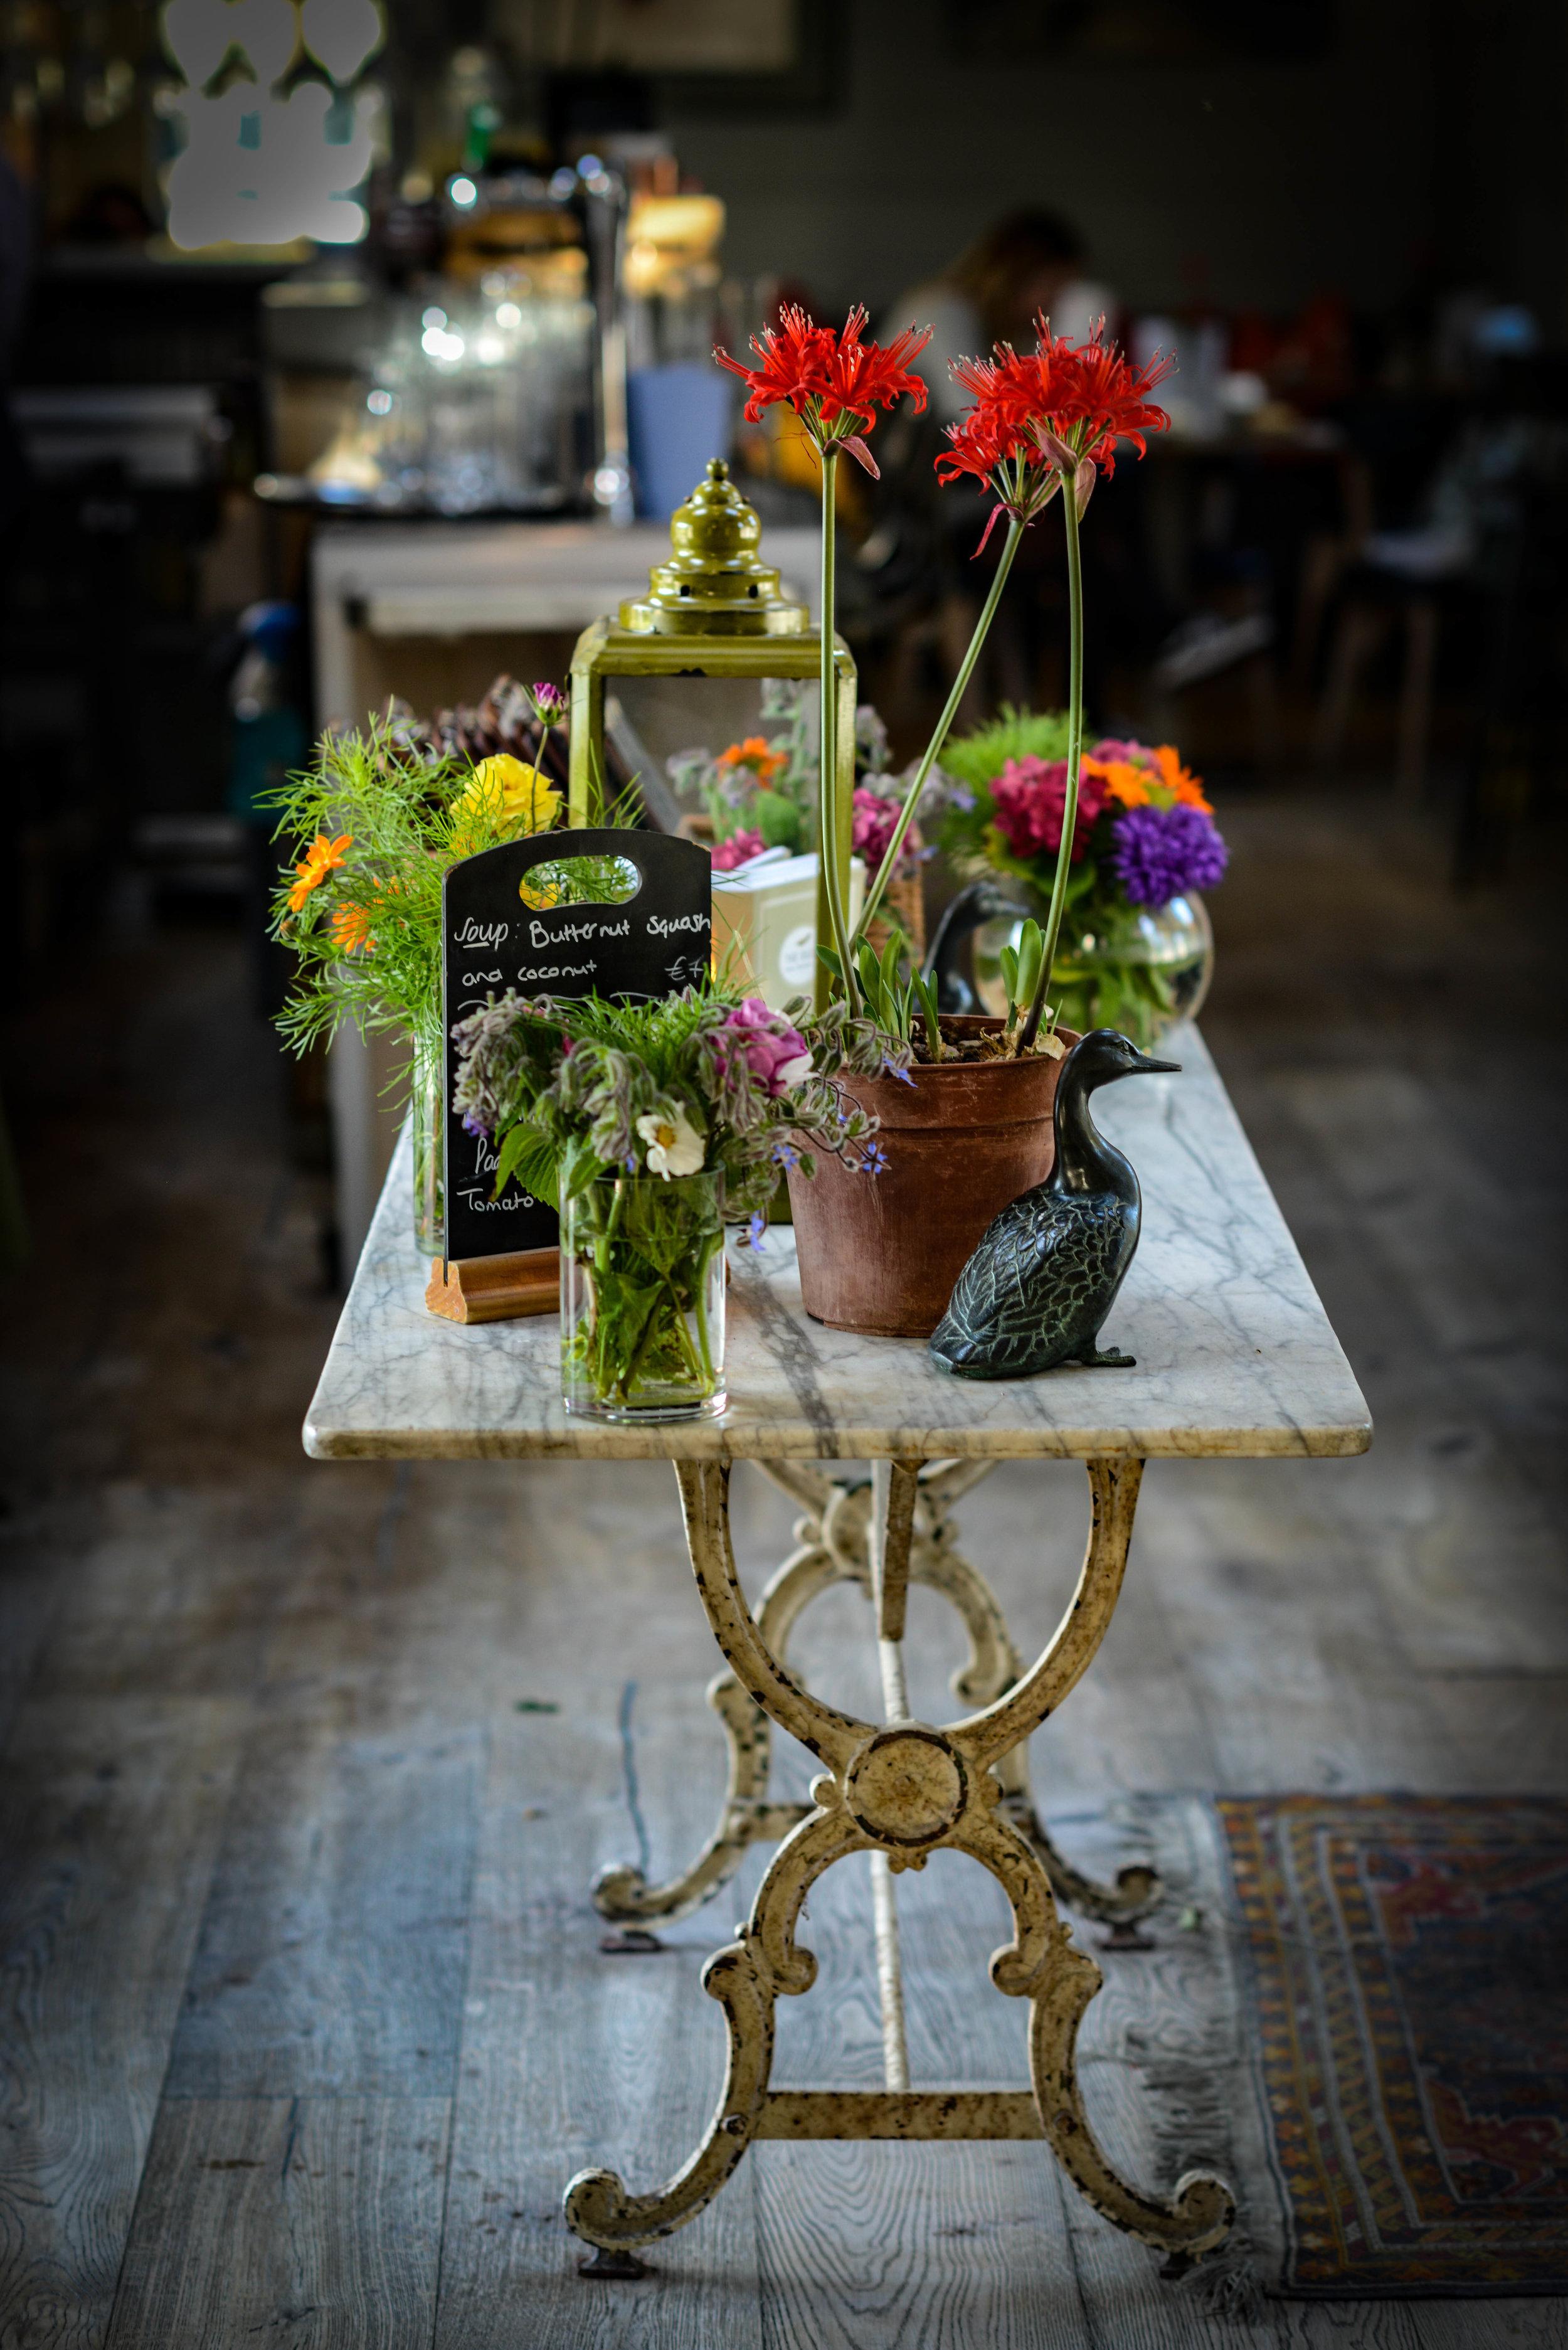 Marfield_House_Duck_Weston_Table.jpg